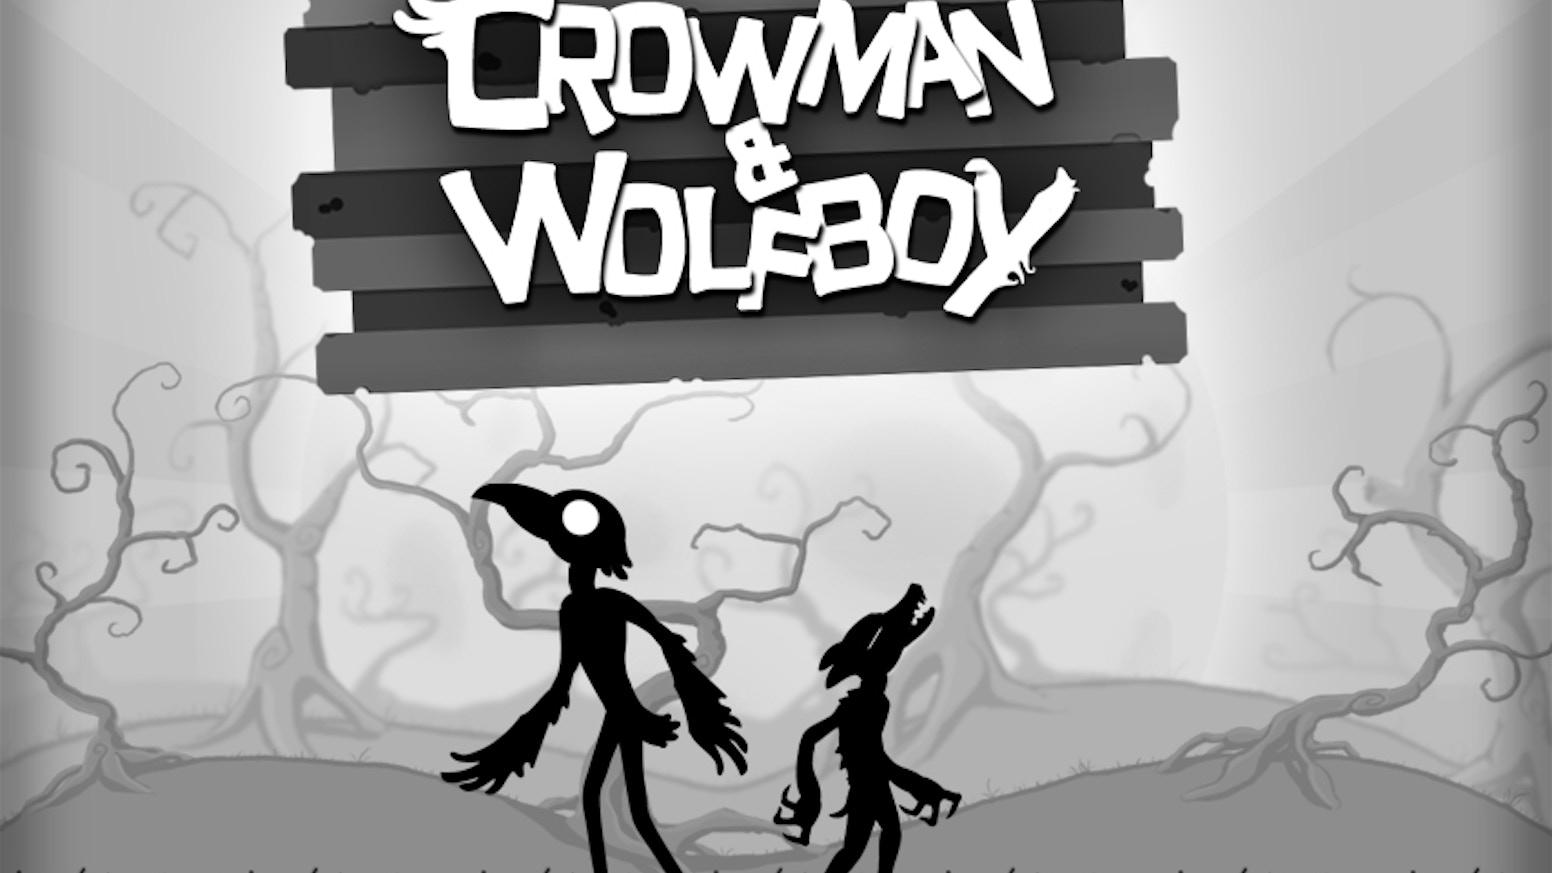 Crowman & Wolfboy - iOS Adventure by Wither Studios, LLC » Crowman